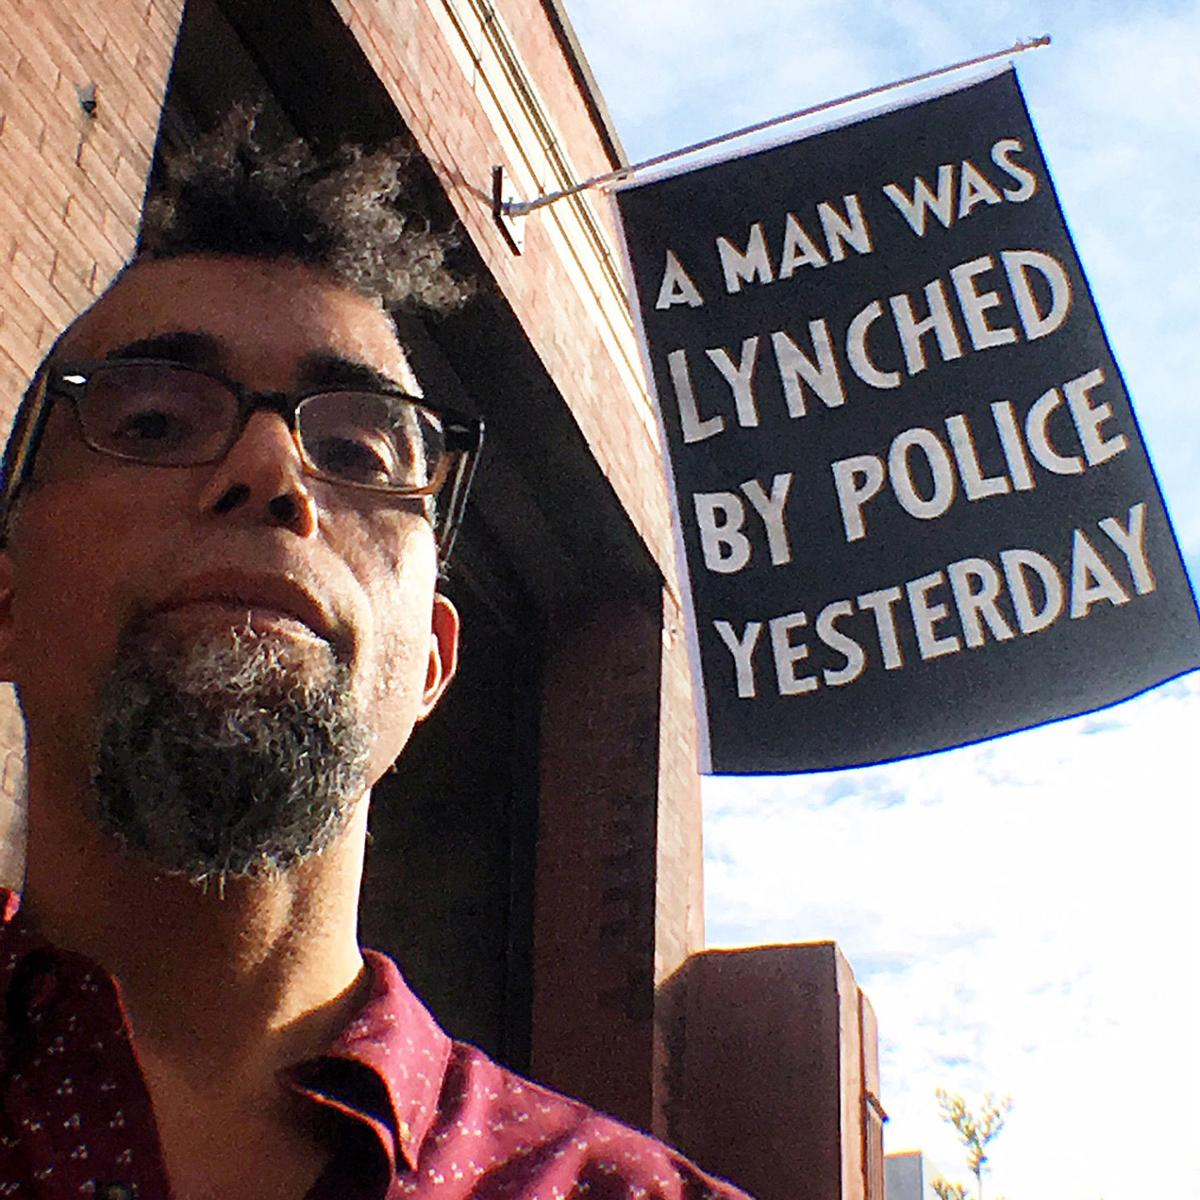 Artist Dread Scott's Black Lives Matter protest flag flies at